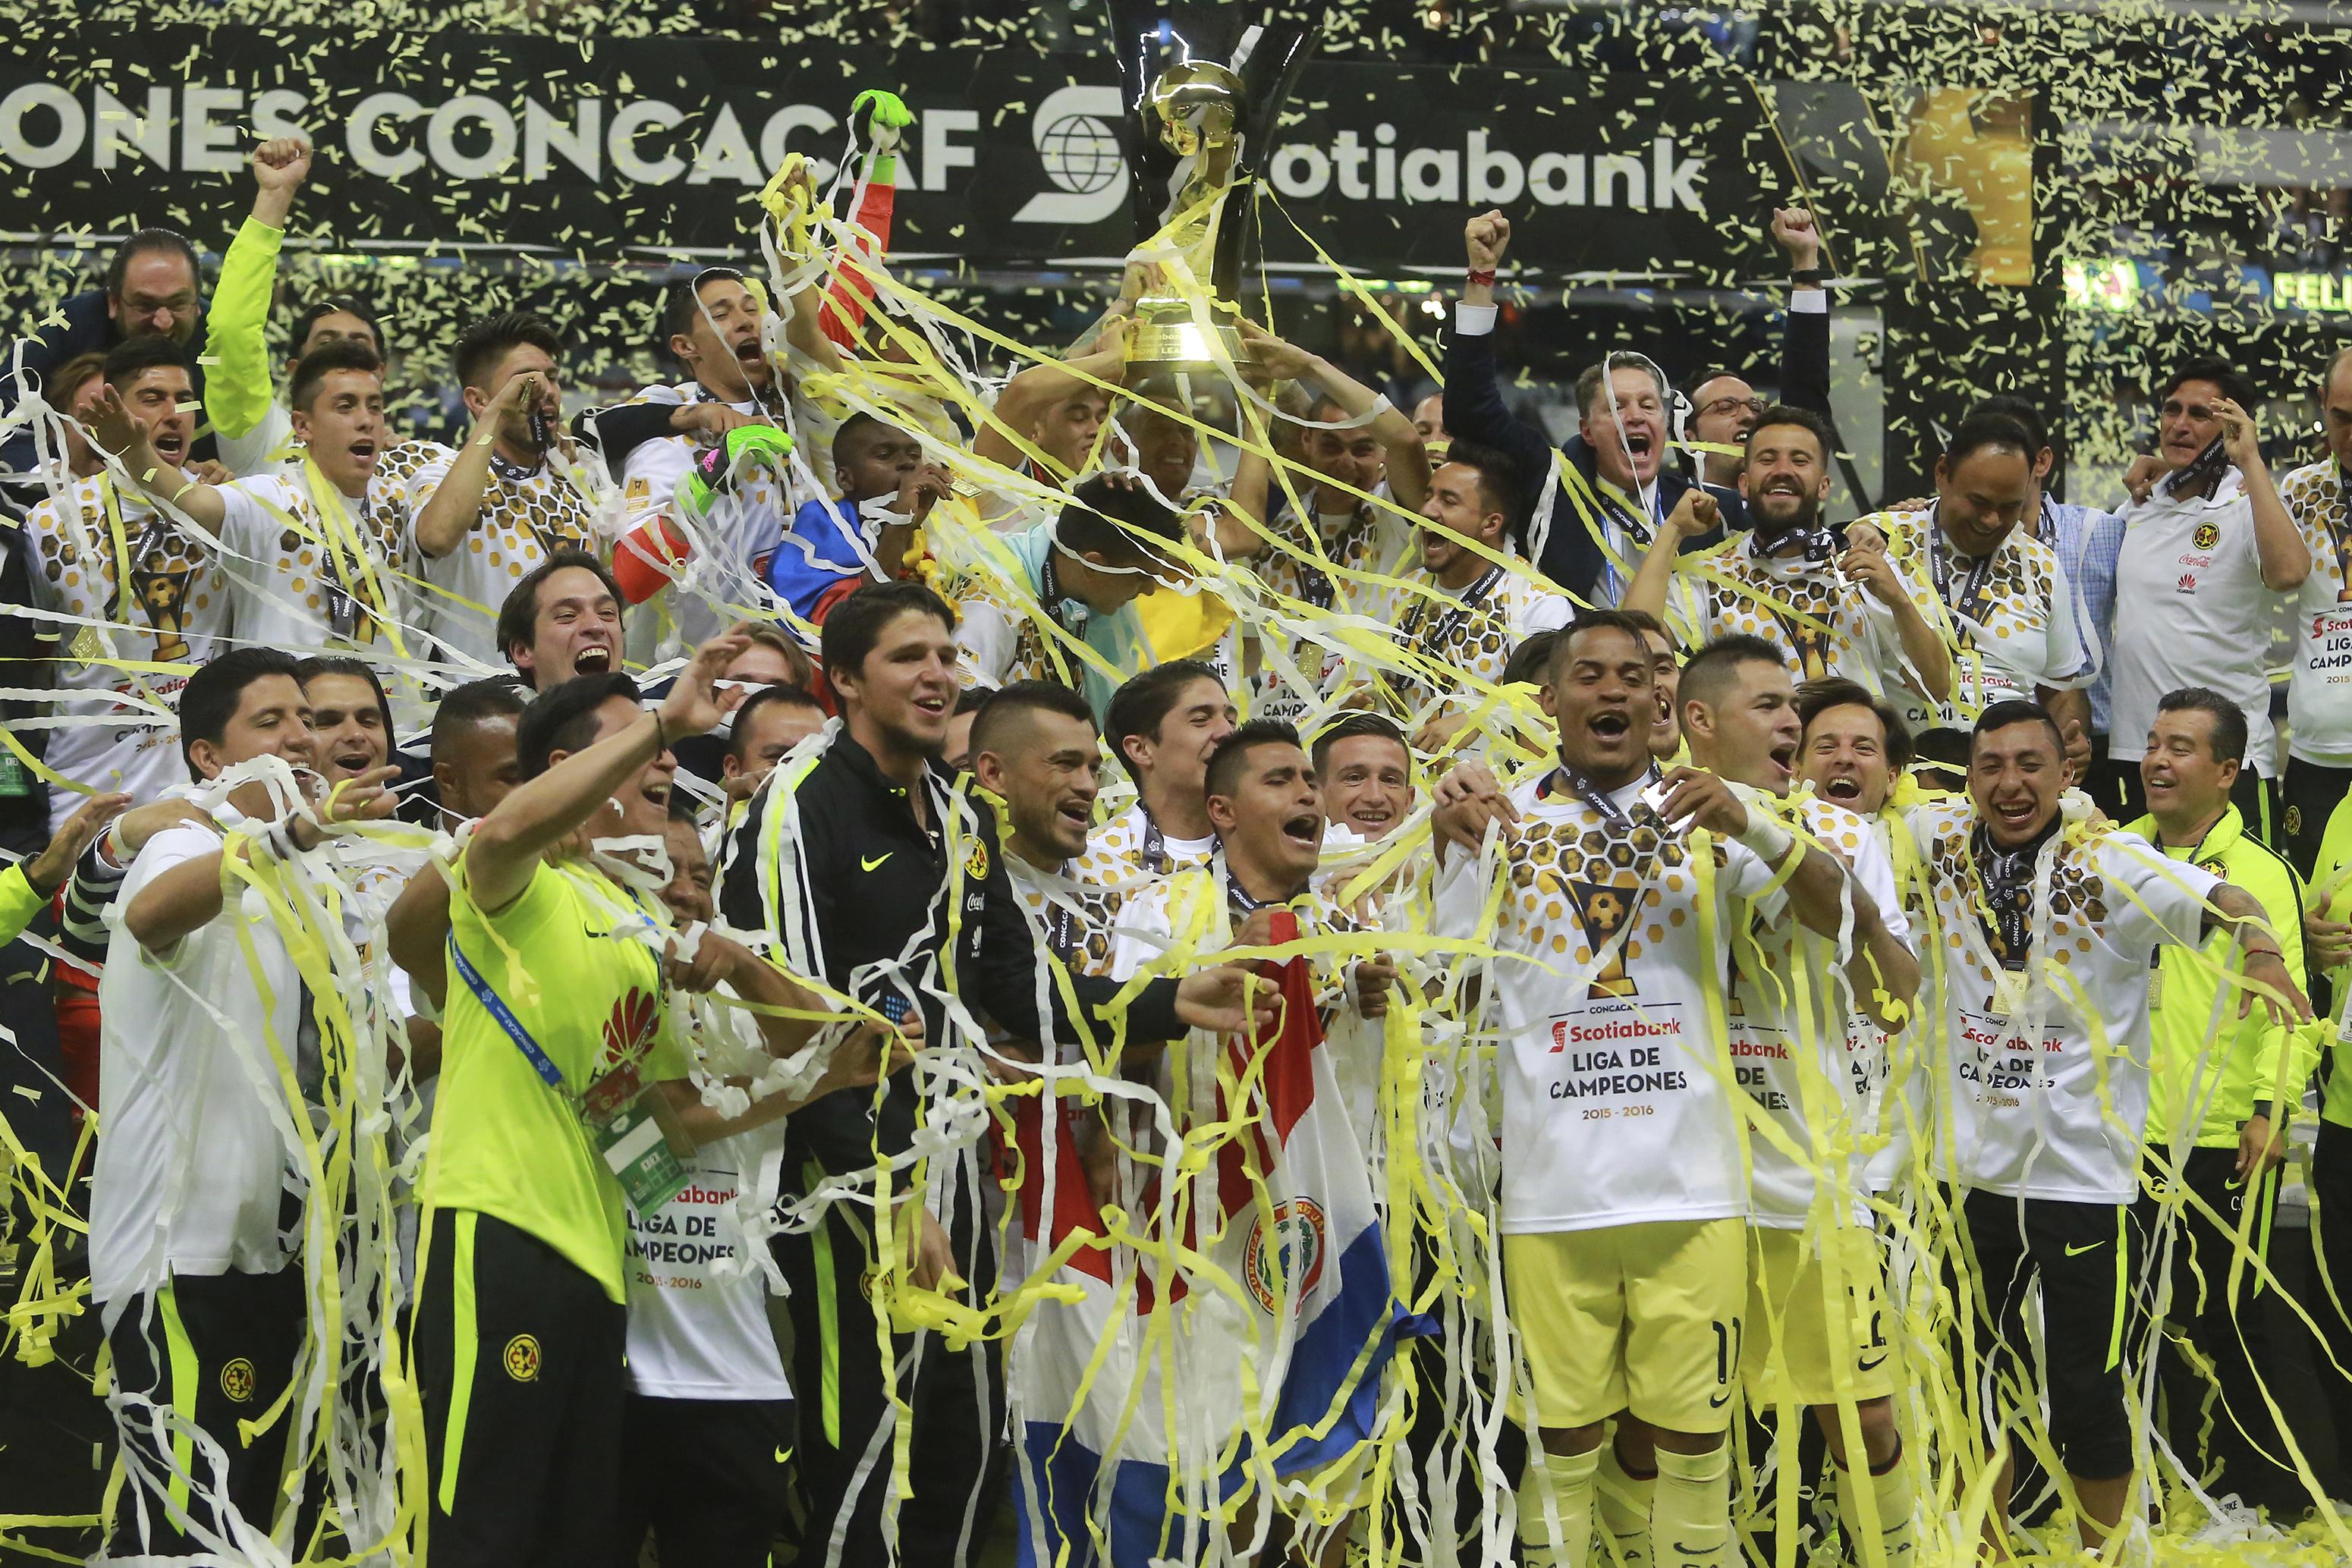 525195854-tigres-uanl-v-america-concacaf-champions-league-2016